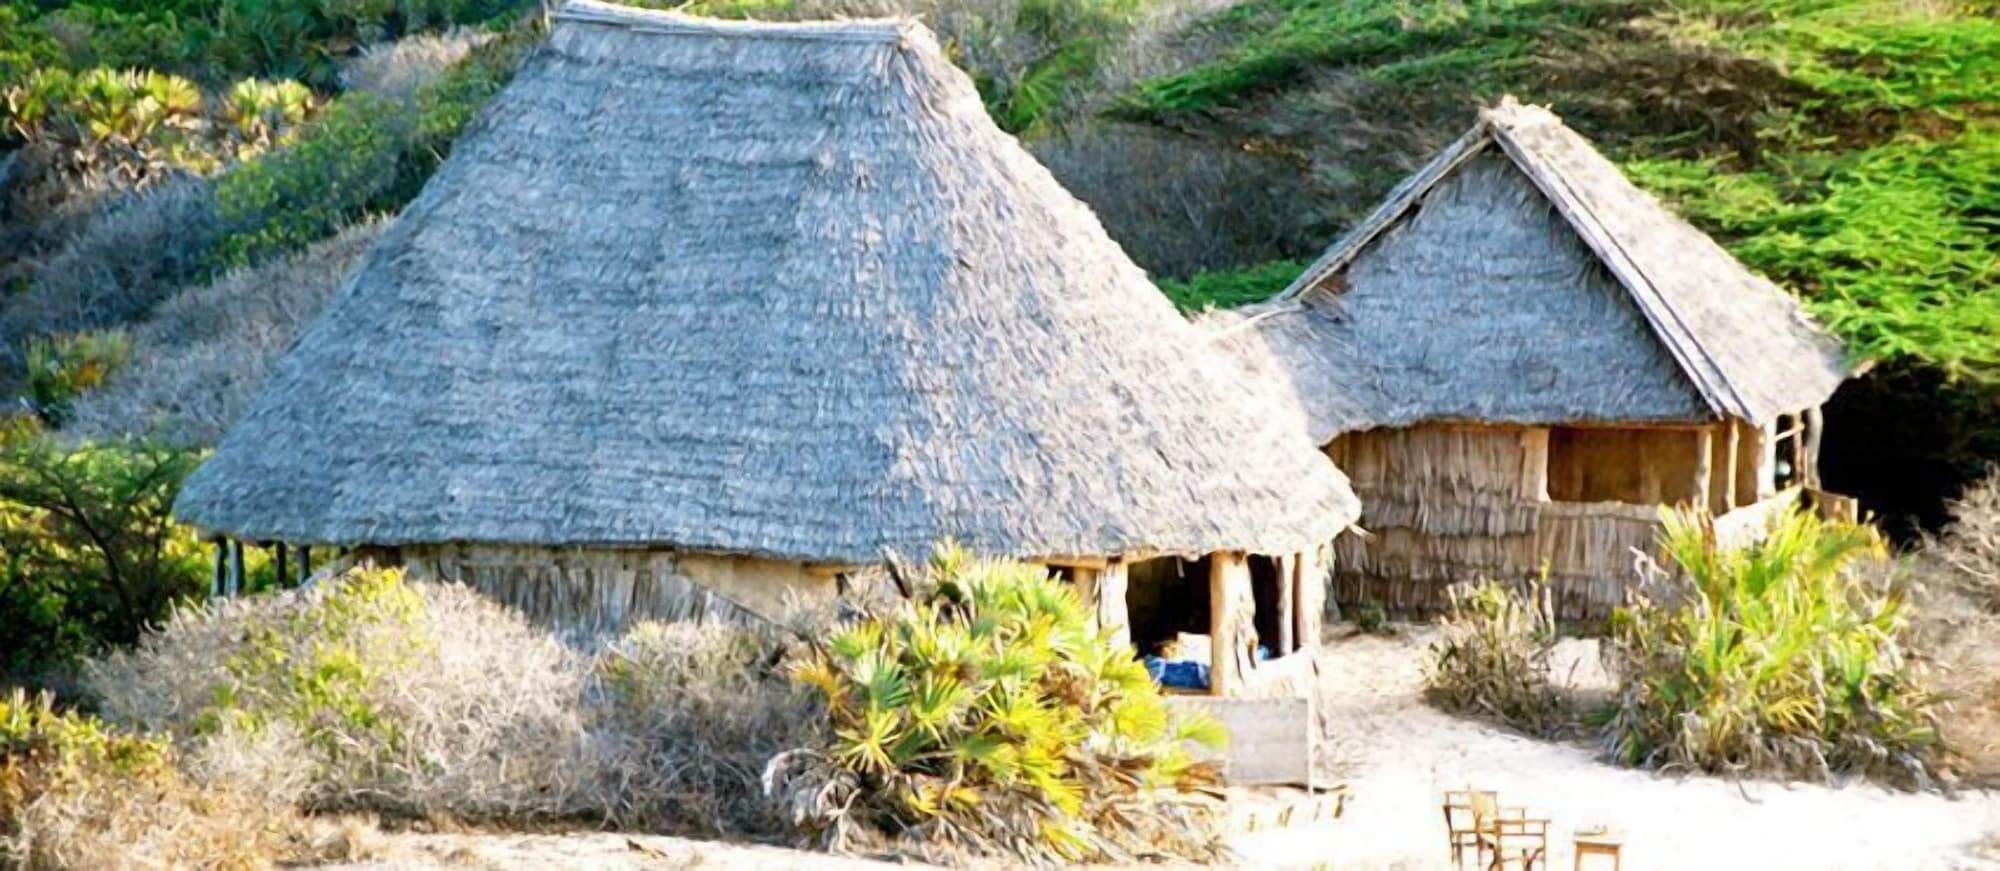 Mikes Camp Kiwayu, Lamu East